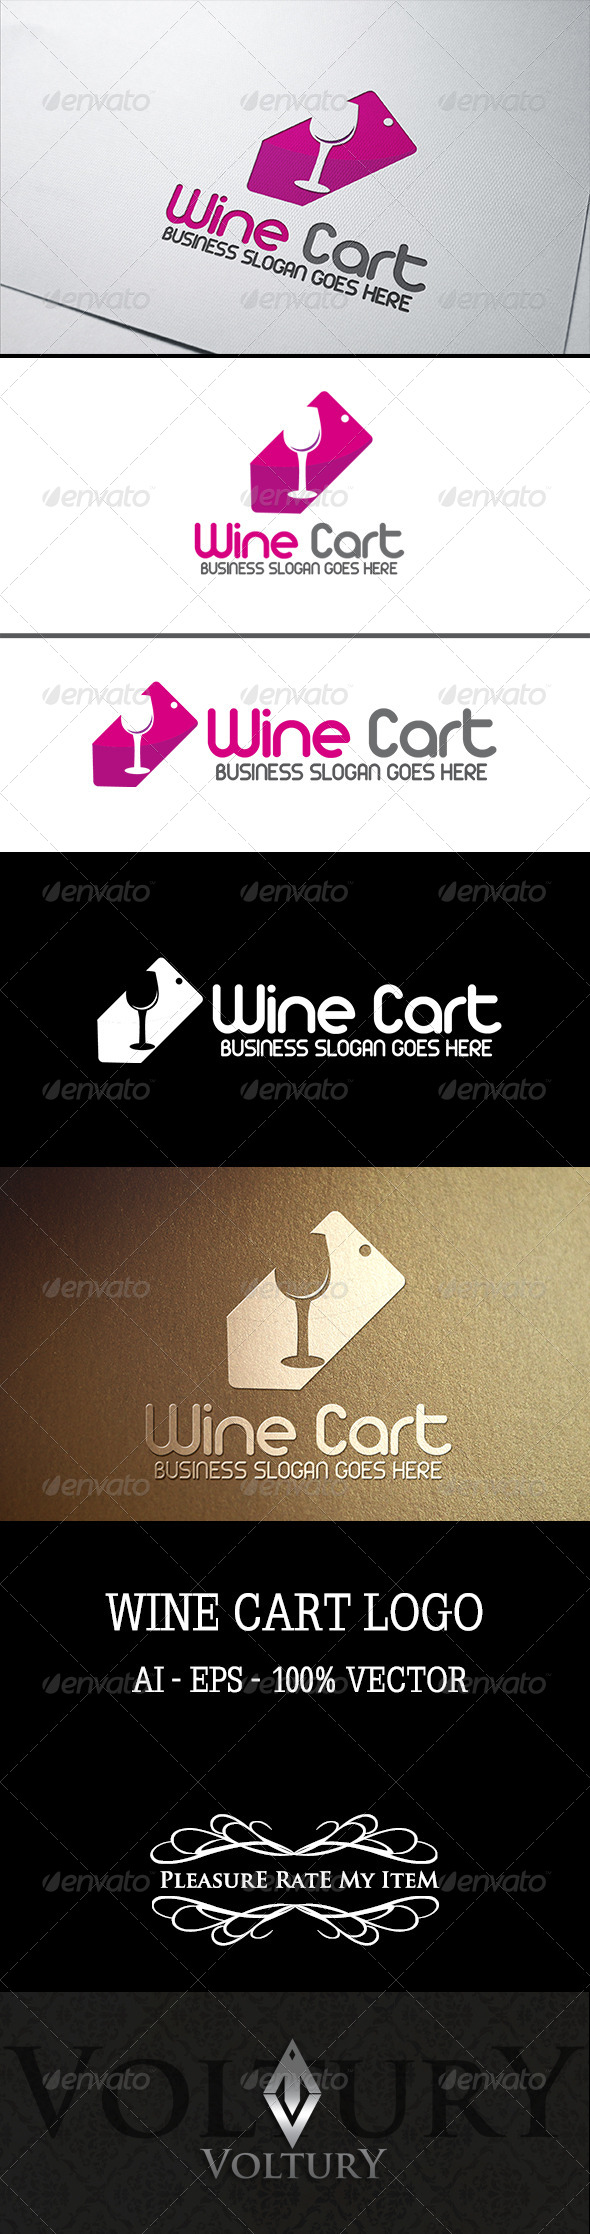 GraphicRiver Wine Cart Logo 7791669